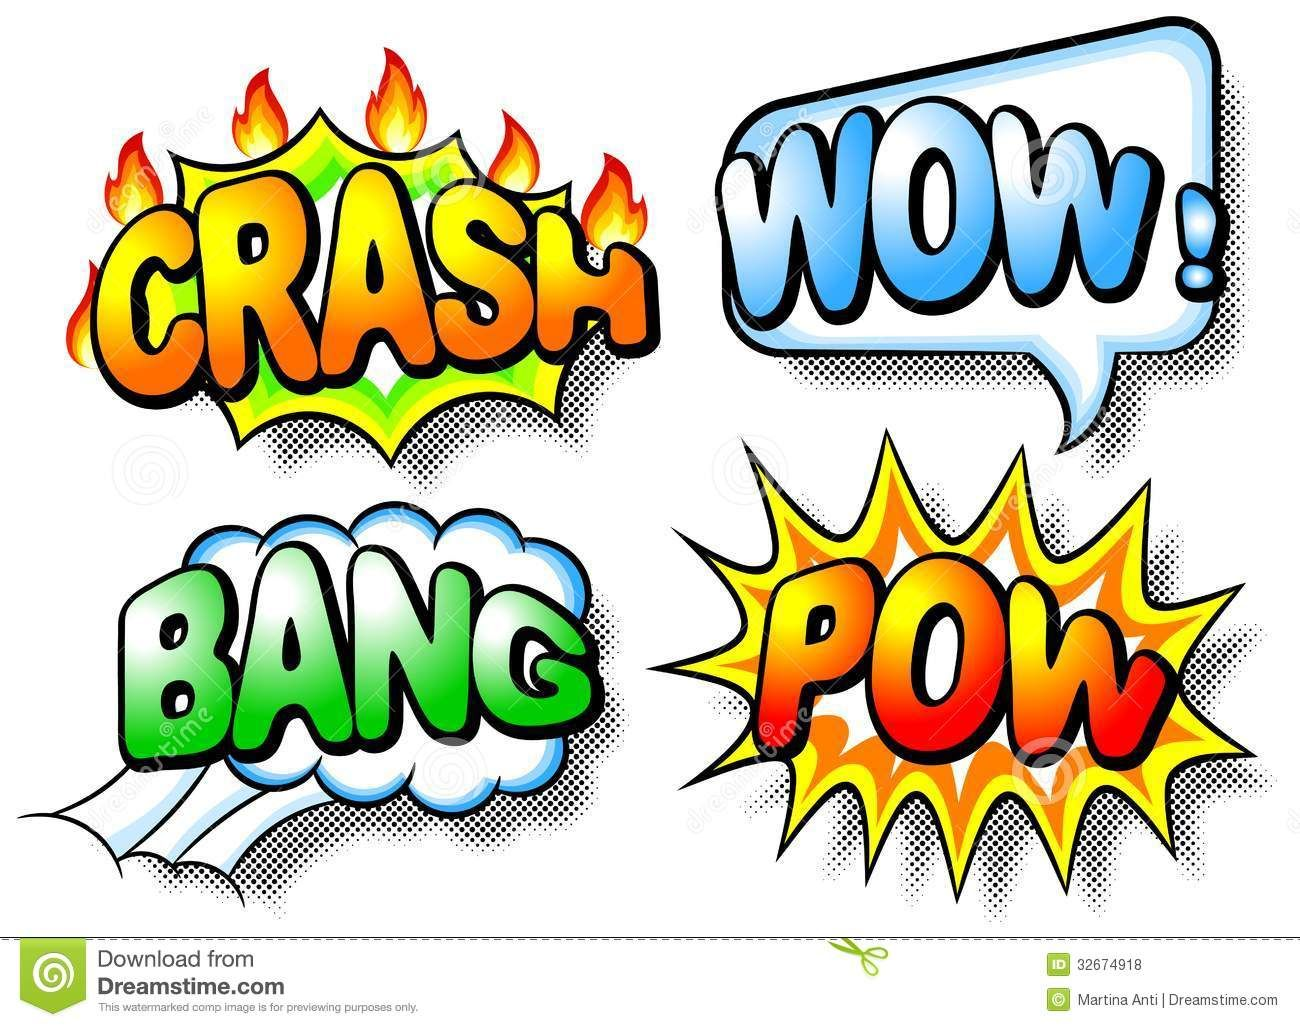 Bang Pow Boom | super punch | Pinterest - 187.5KB